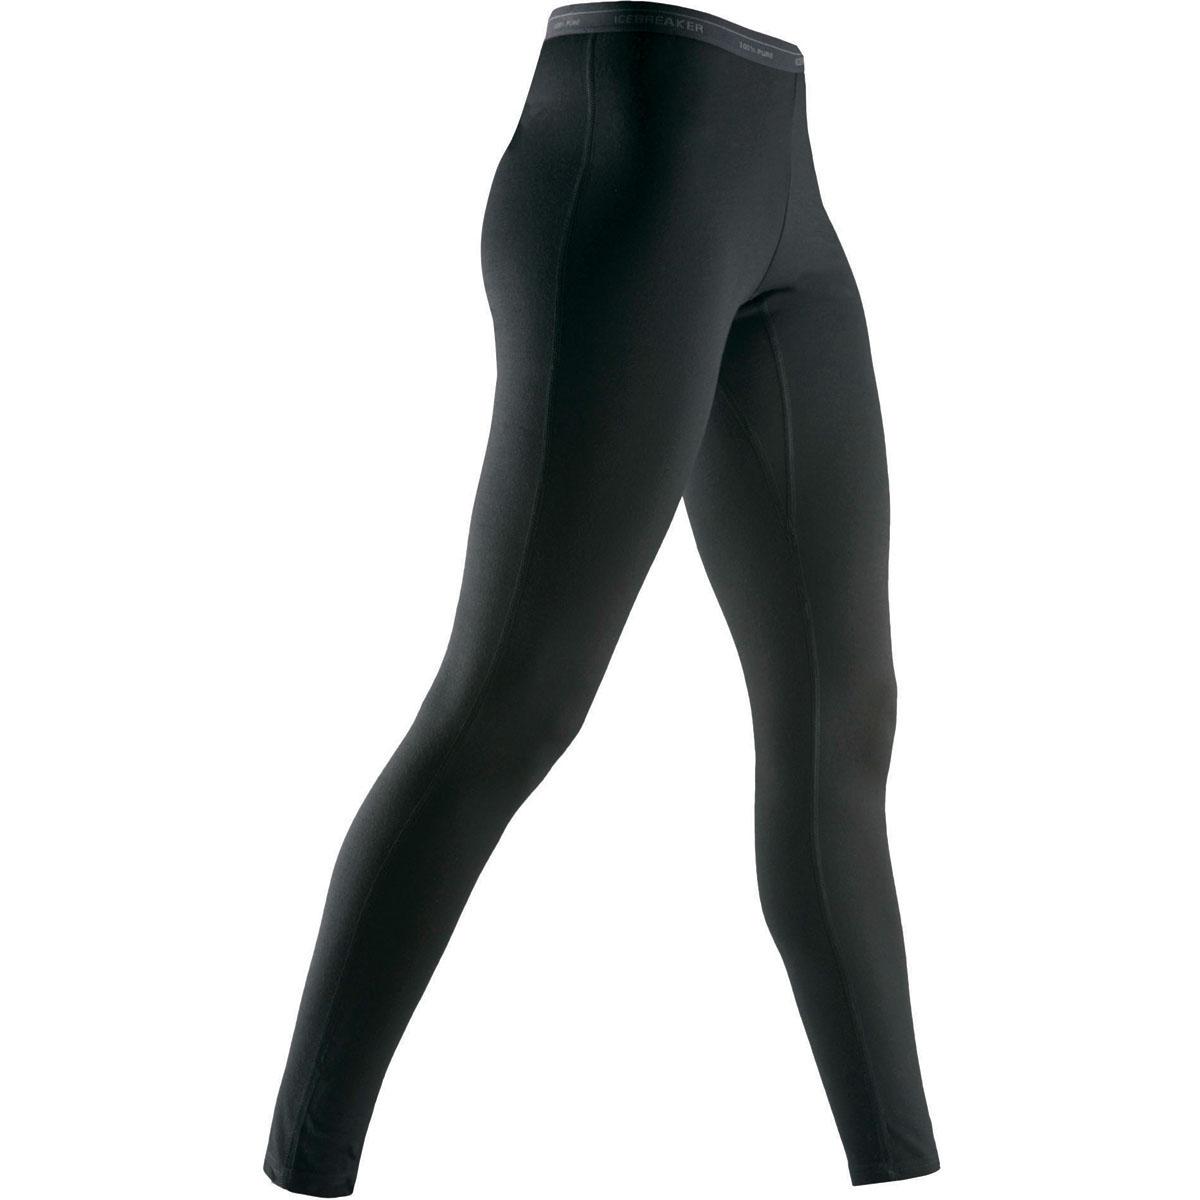 Image result for leggings black woman